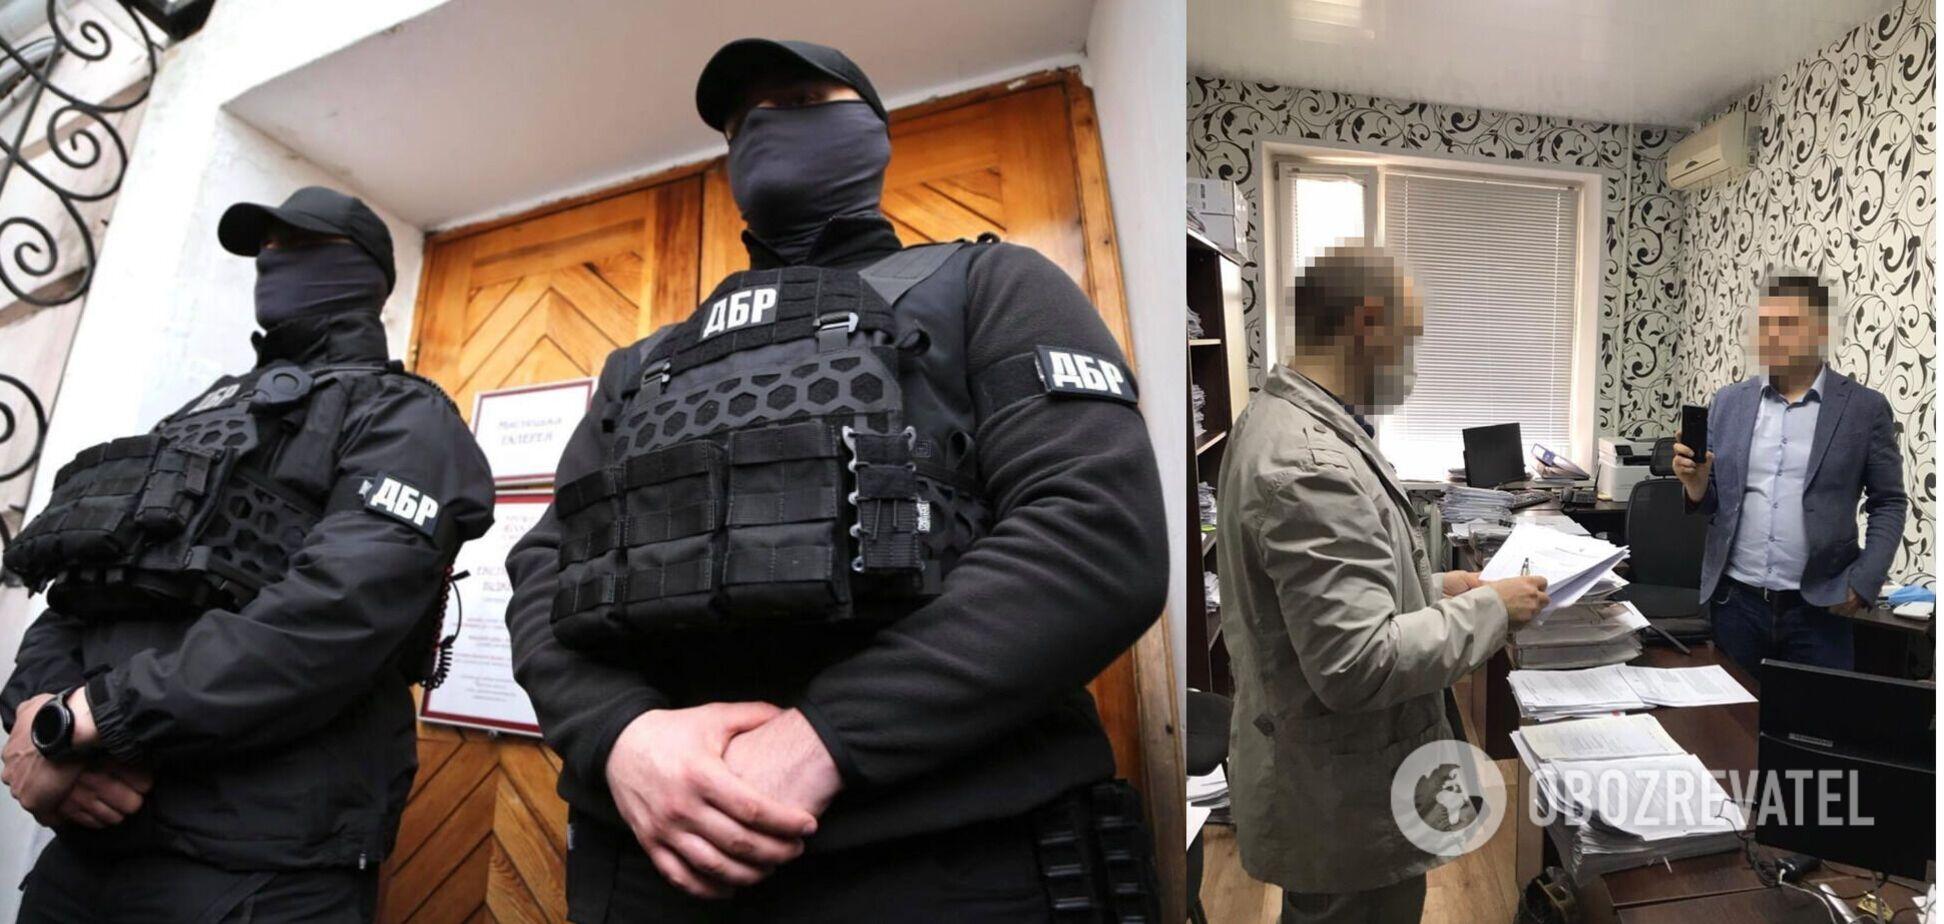 На Днепропетровщине исчезли изъятые товары на 10 млн: подозрение получил экс-прокурор